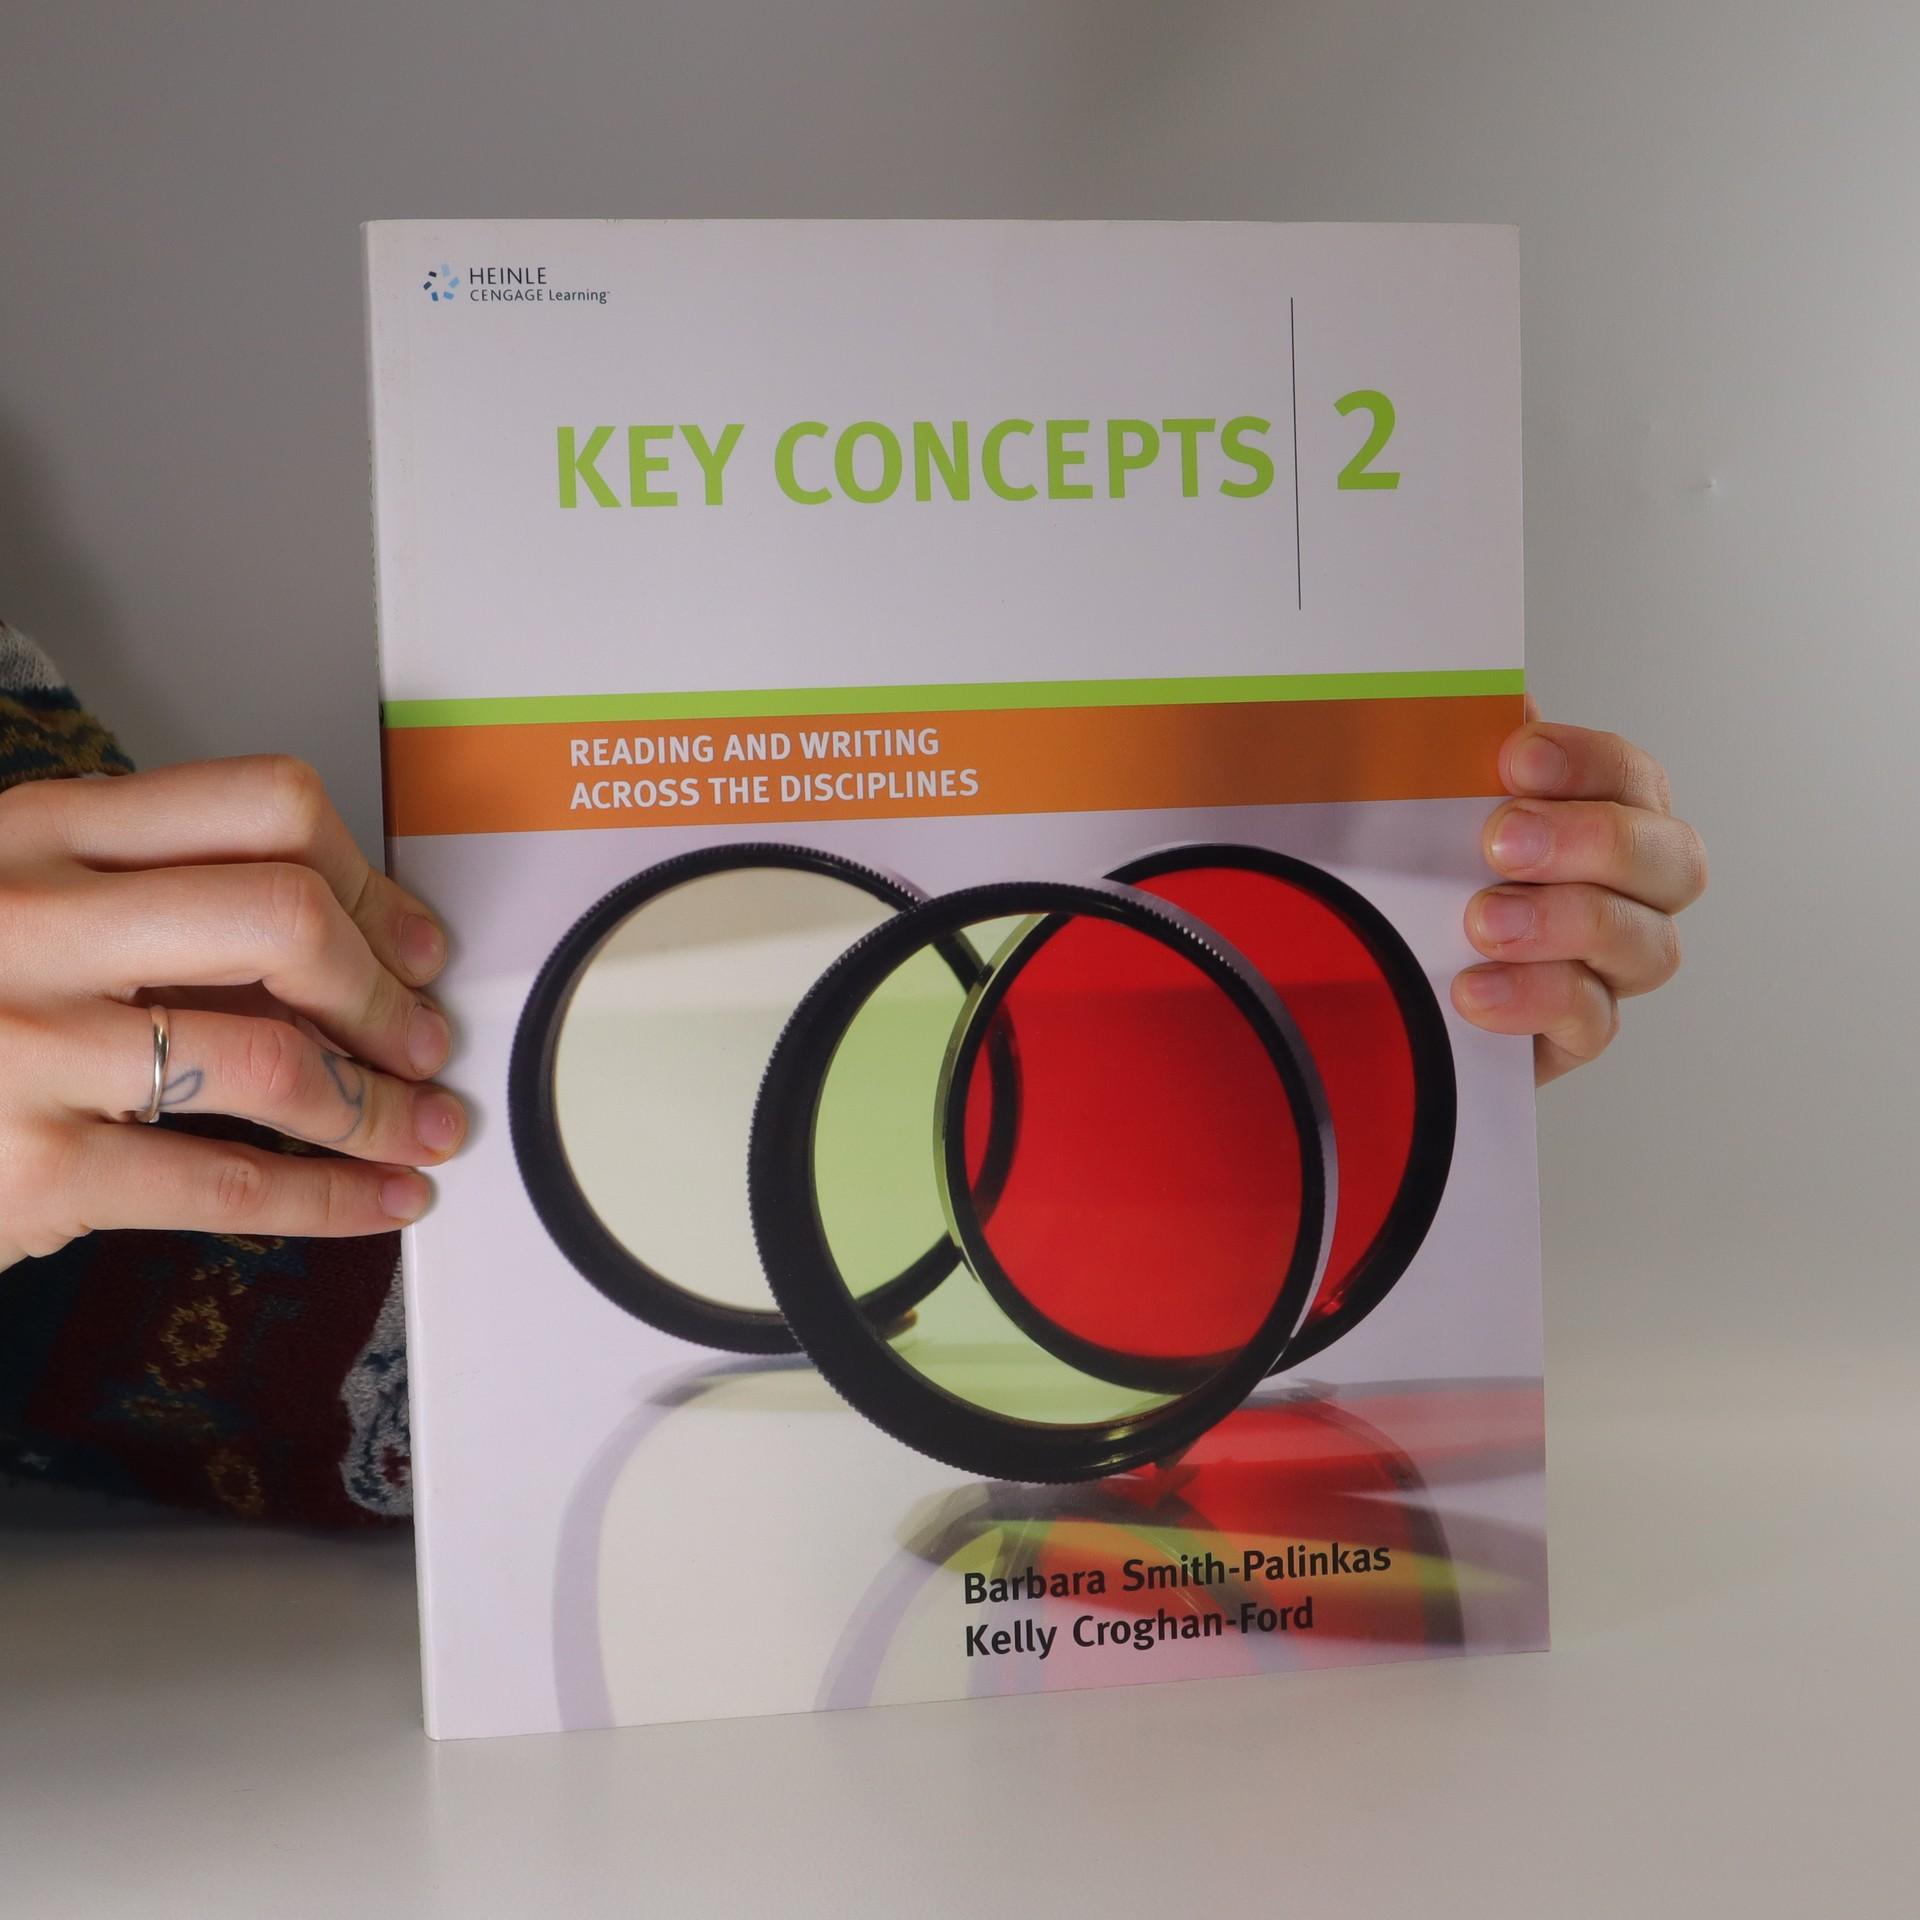 antikvární kniha Key concepts 2 : reading and writing across the disciplines., neuveden